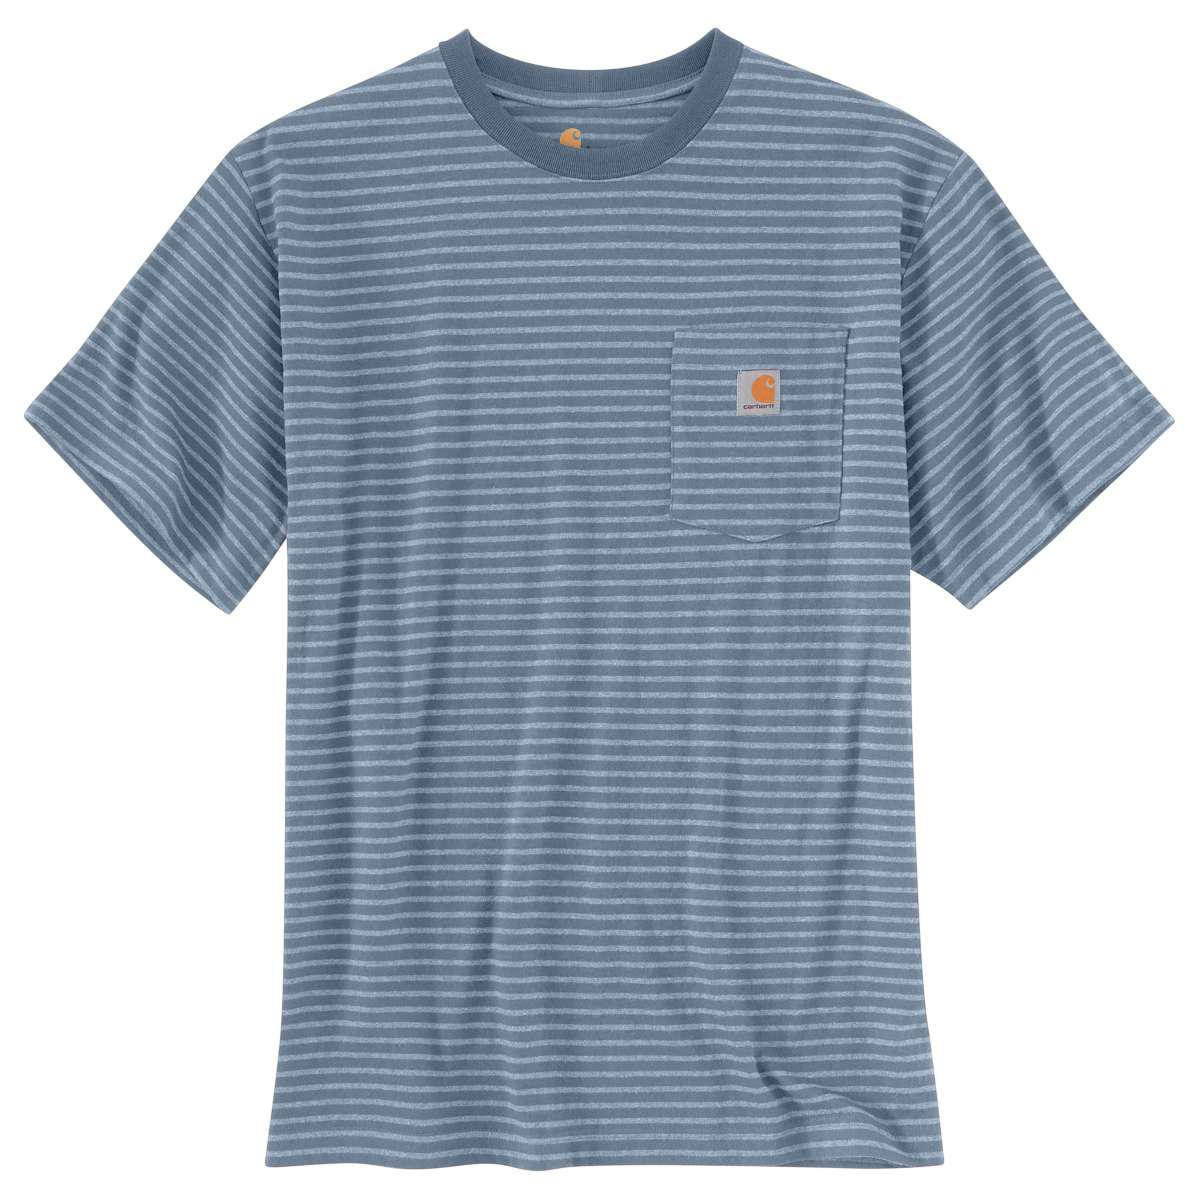 Carhartt Men's Workwear Pocket Short-Sleeve Tee - Blue, XXL